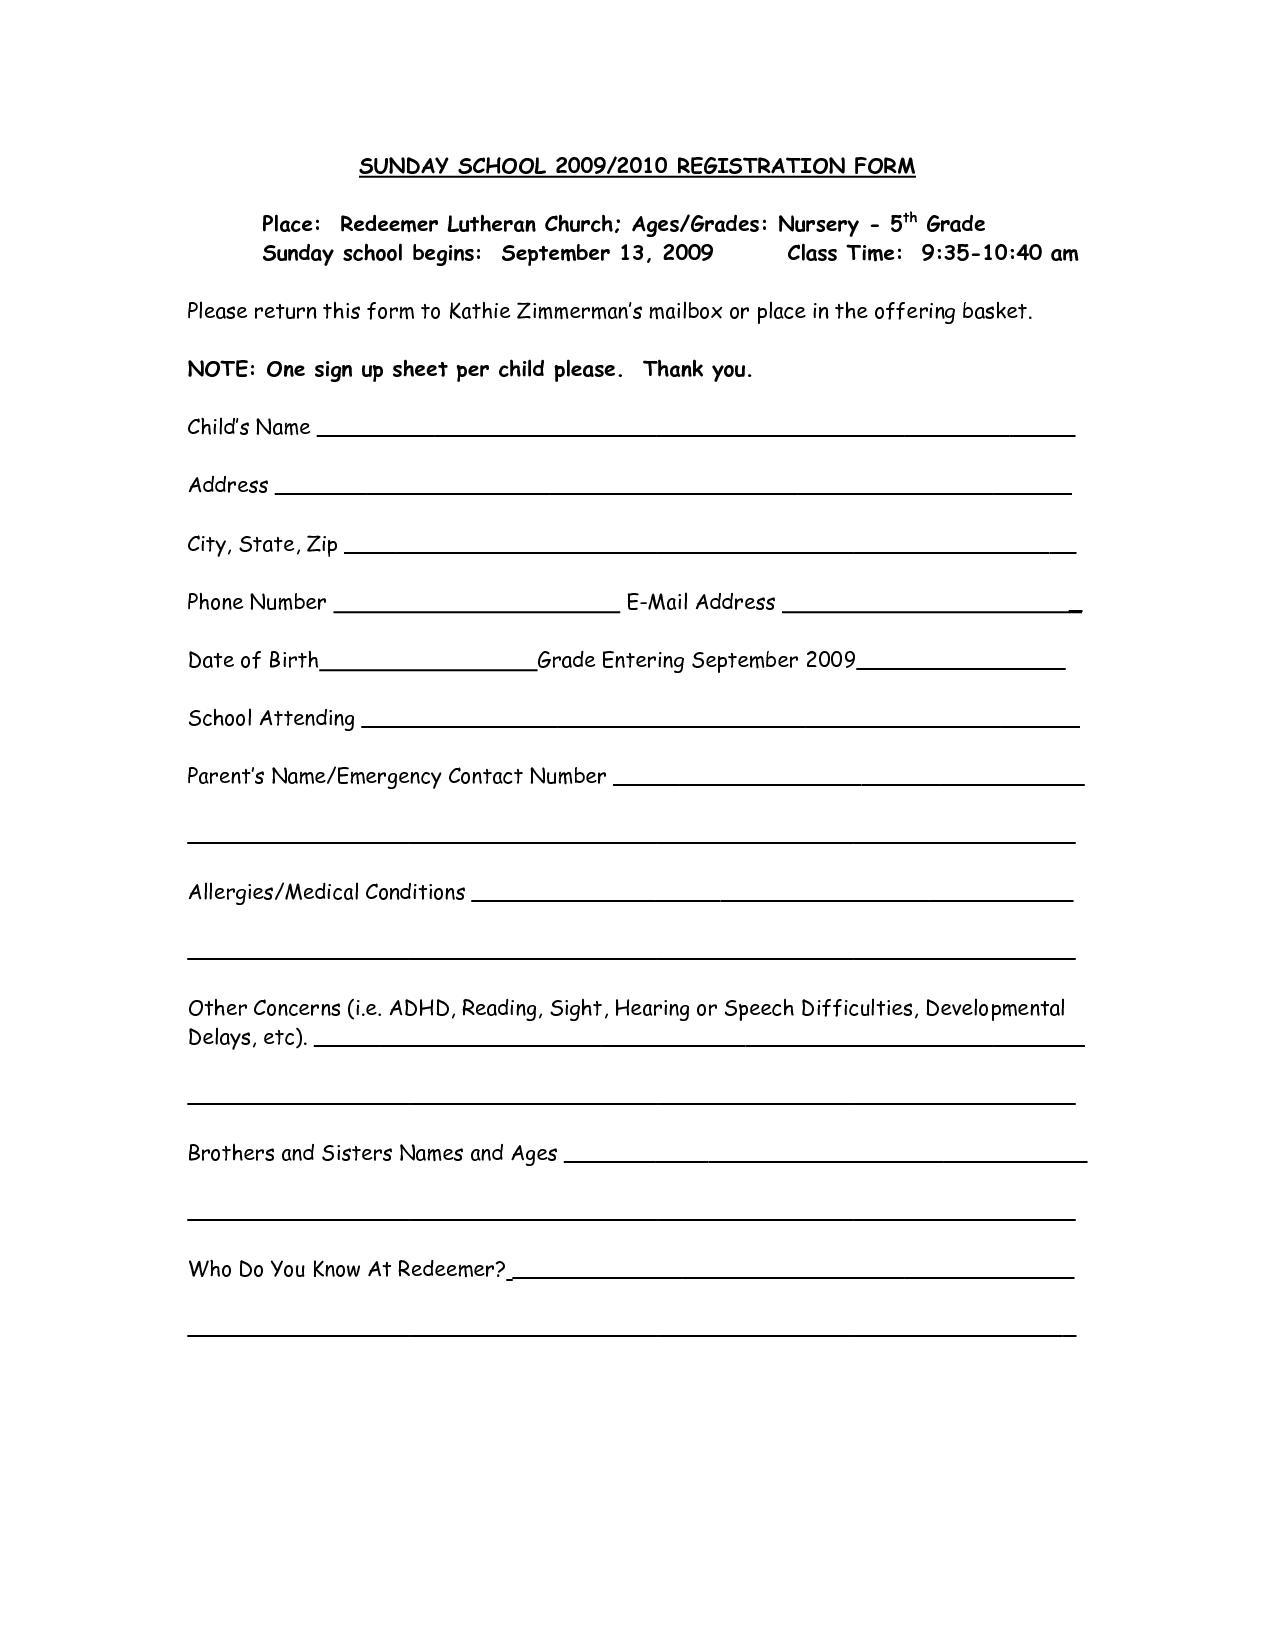 Sunday School Sign In Sheet Registration Form School Signs Registration